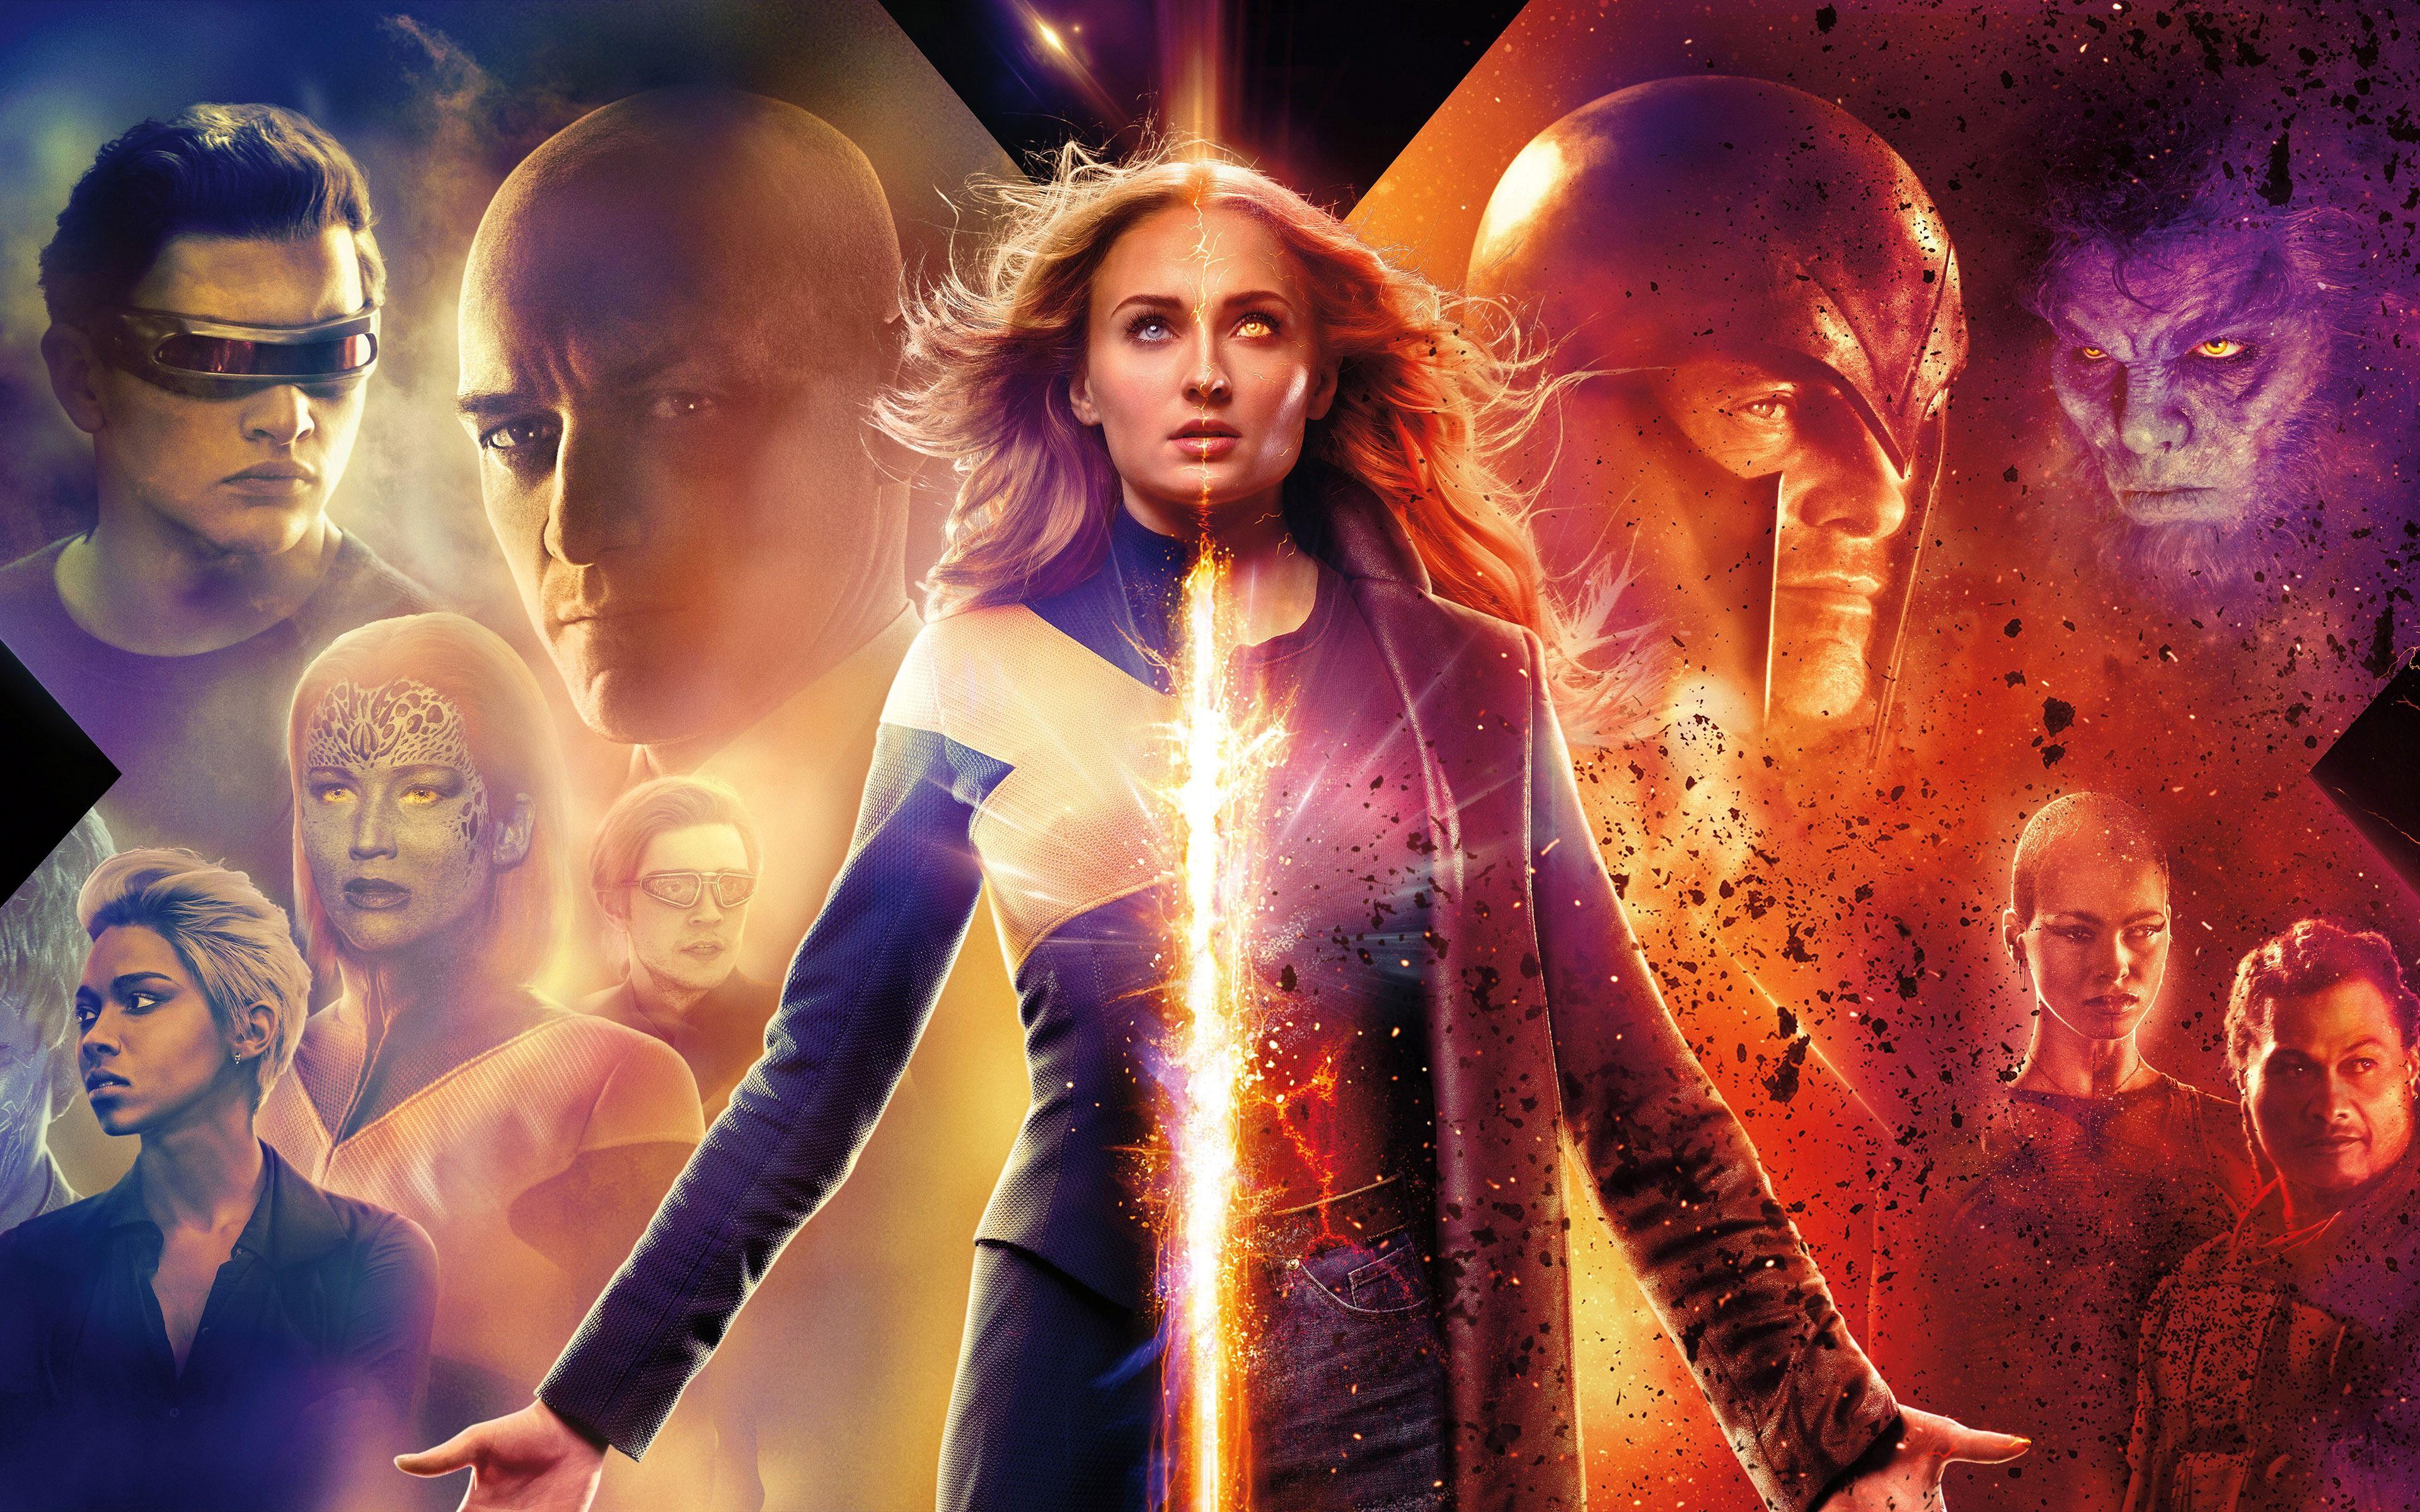 Dark Phoenix Movie Poster Hd Wallpaper 4k Free Download Dark Phoenix Full Movies Online Free Full Movies